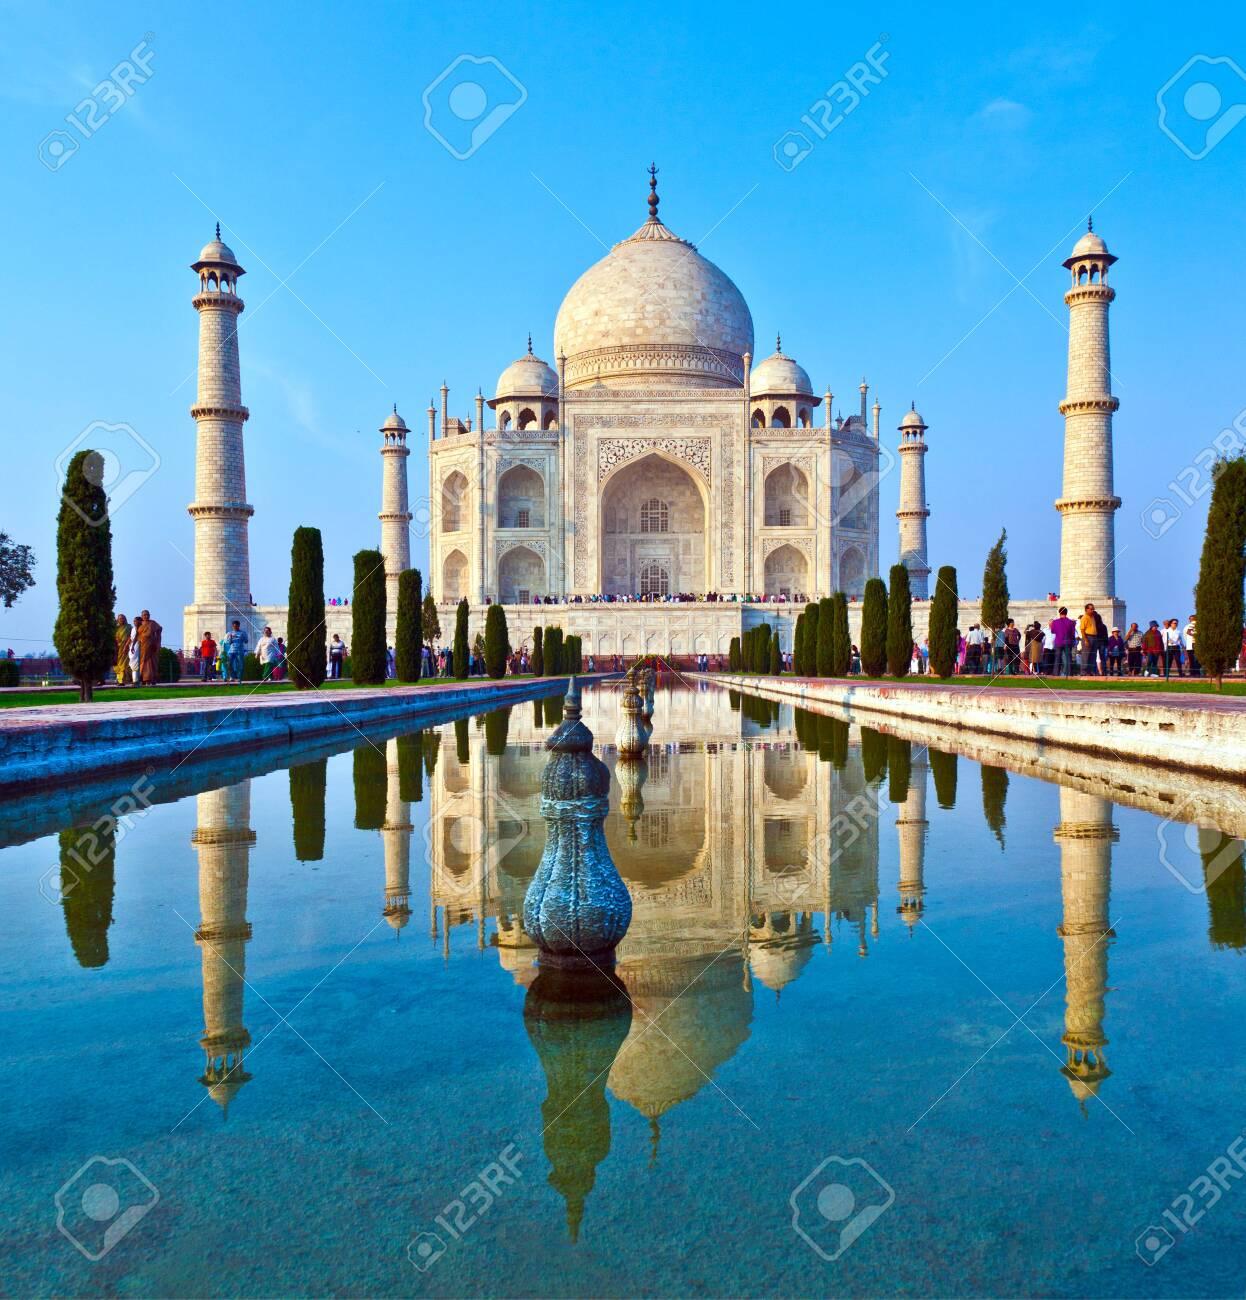 AGRA, INDIA - NOV 15, 2011: people visit beautiful Taj Mahal in India with blue sky - 140145422